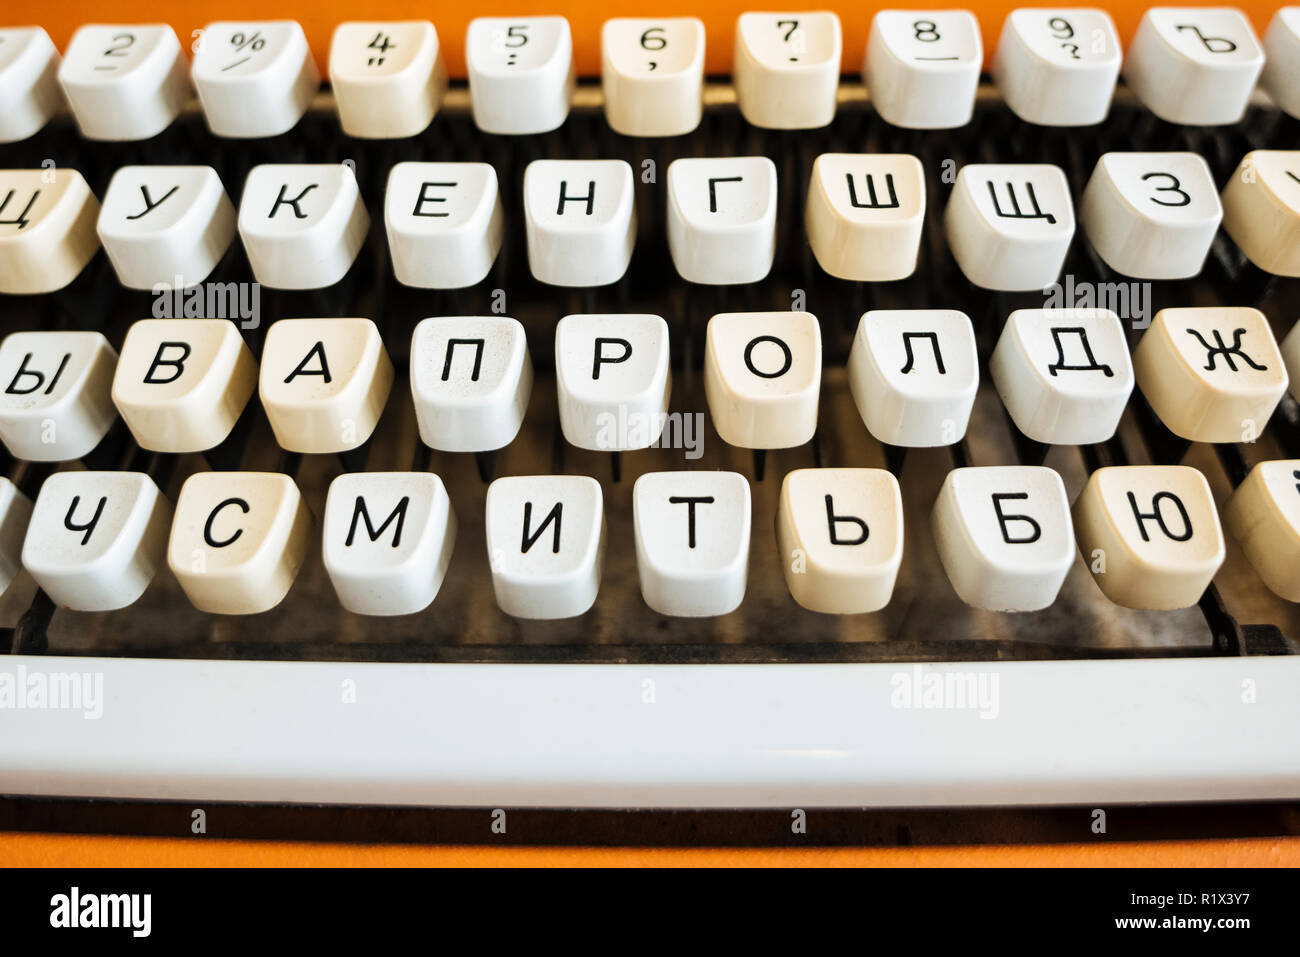 Close up of Russian Typewriter, KGB Museum, Tallinn, Estonia, Europe - Stock Image